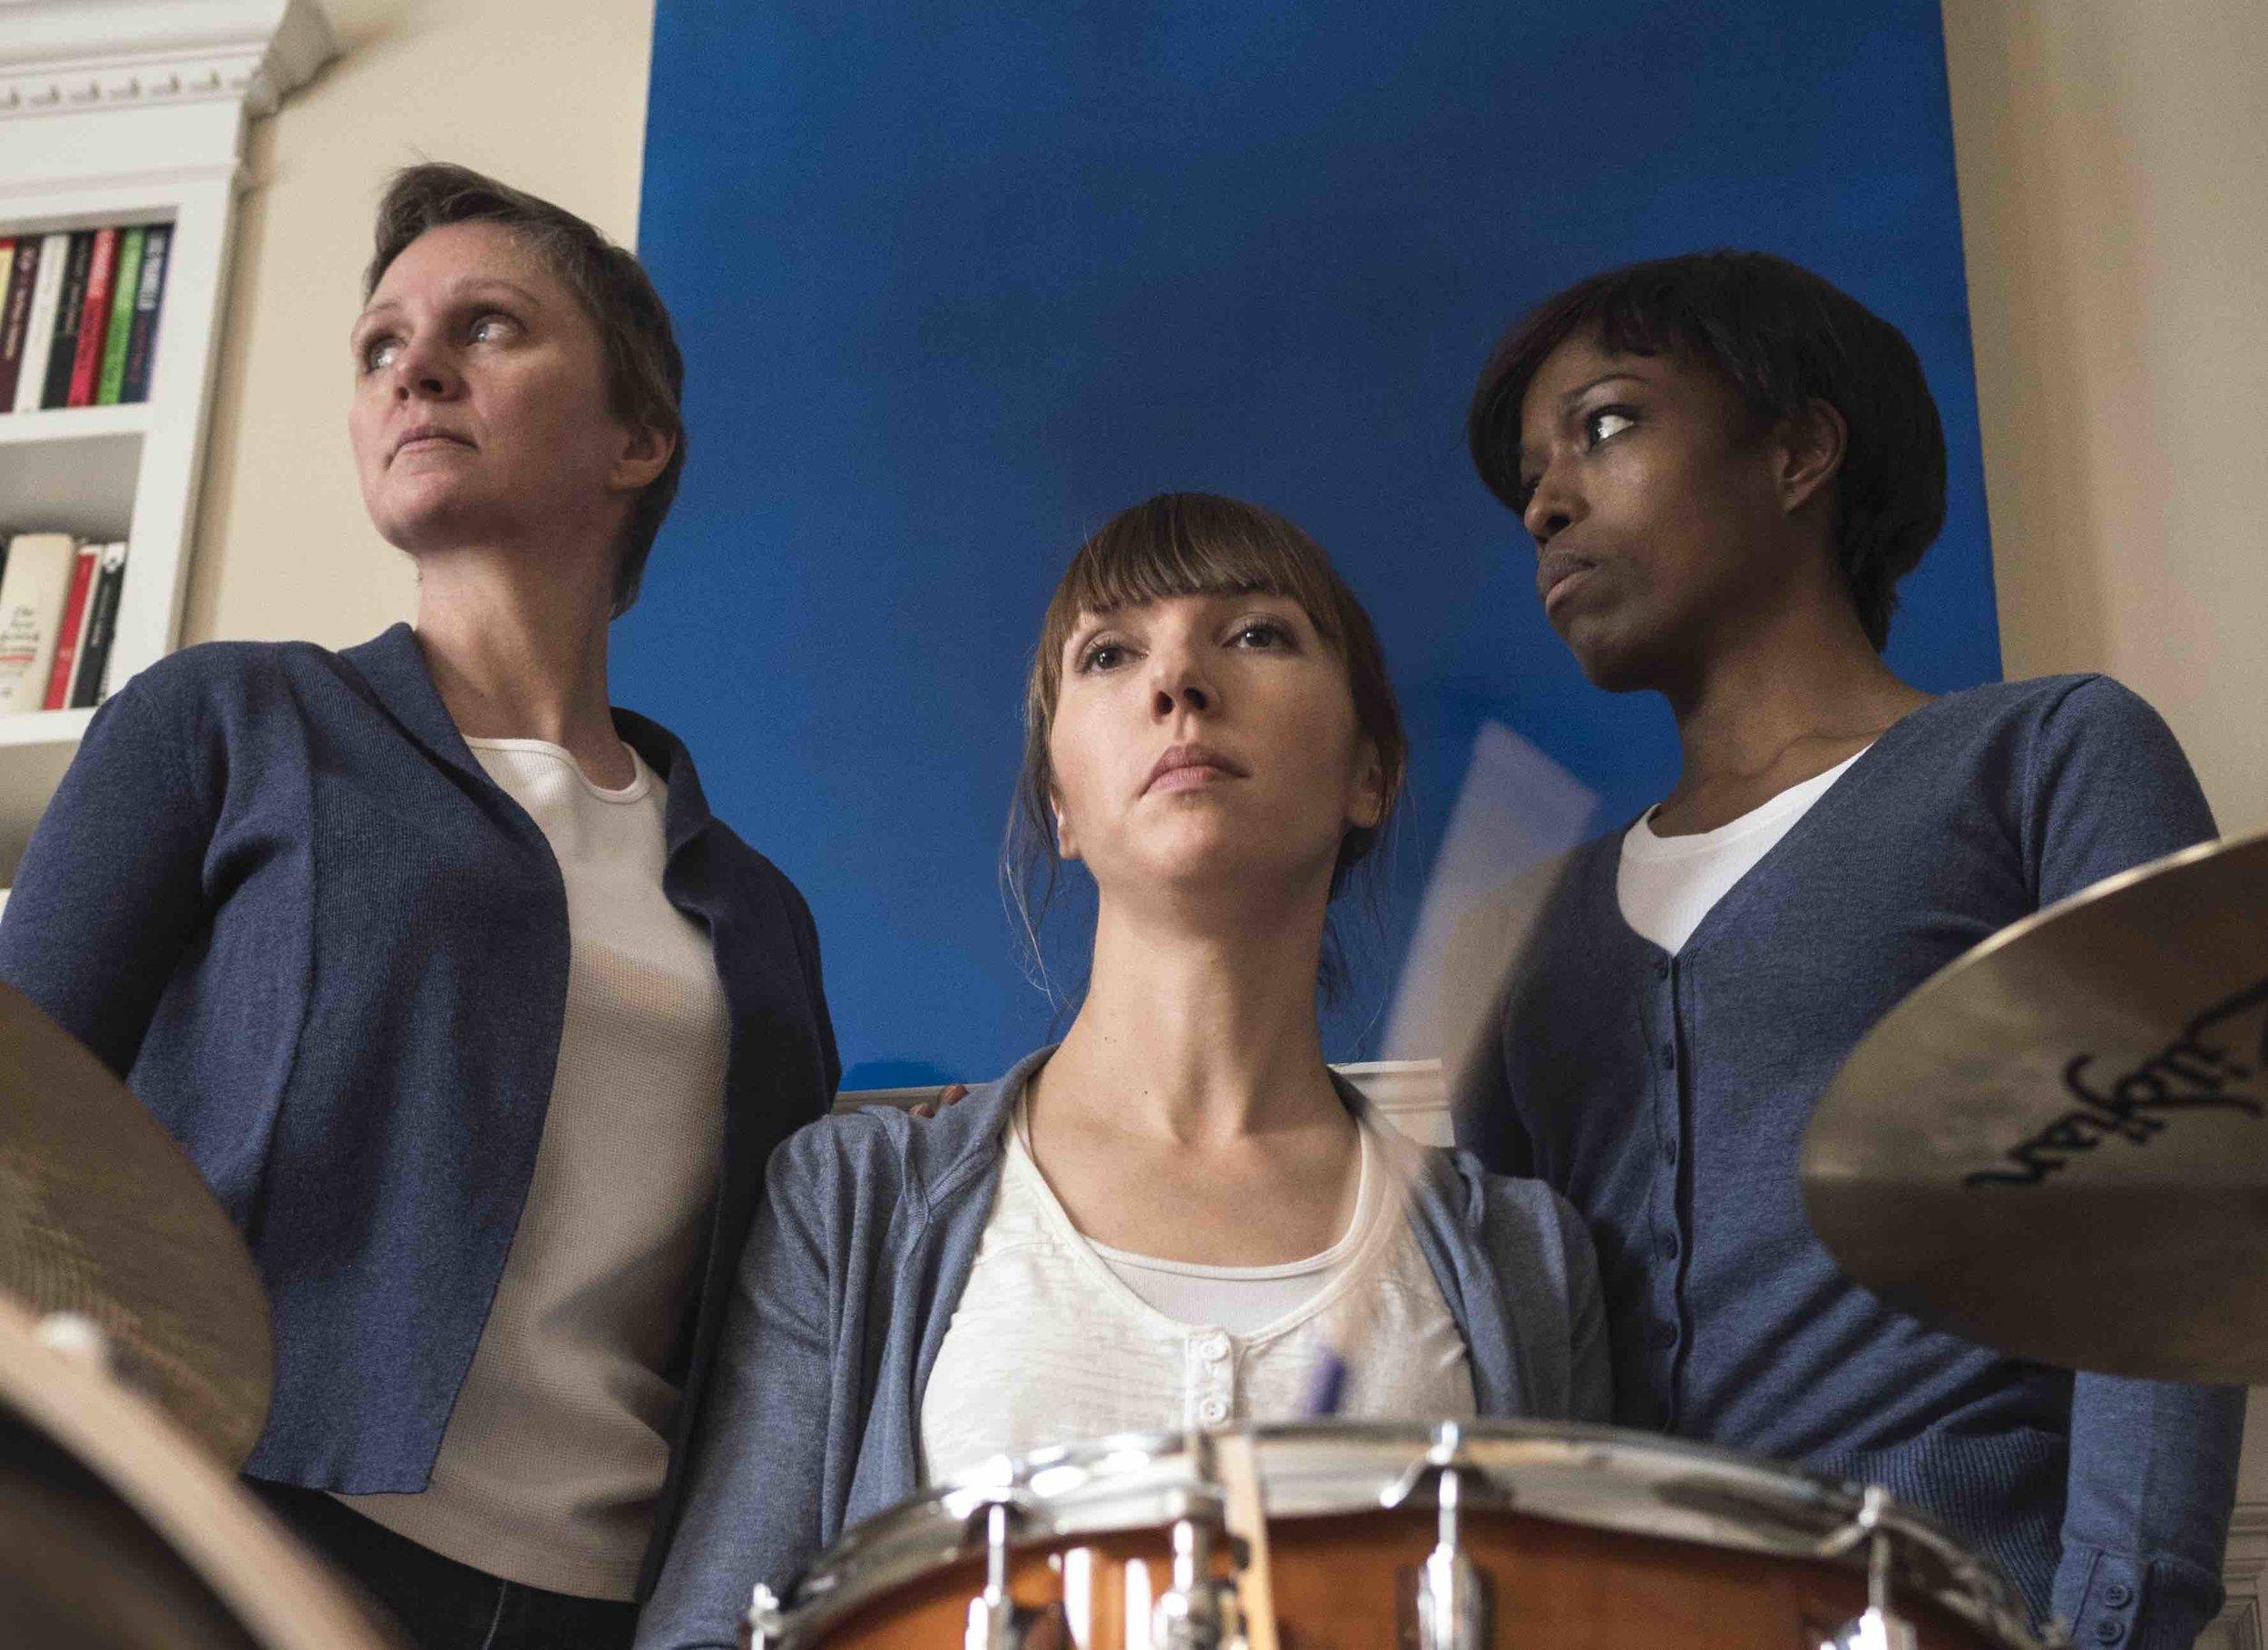 Deborah Drakeford, Lynette Gillis and Kim Nelson steer clear of sensationalism in disturbing verbatim play. (Yuri Dojc)